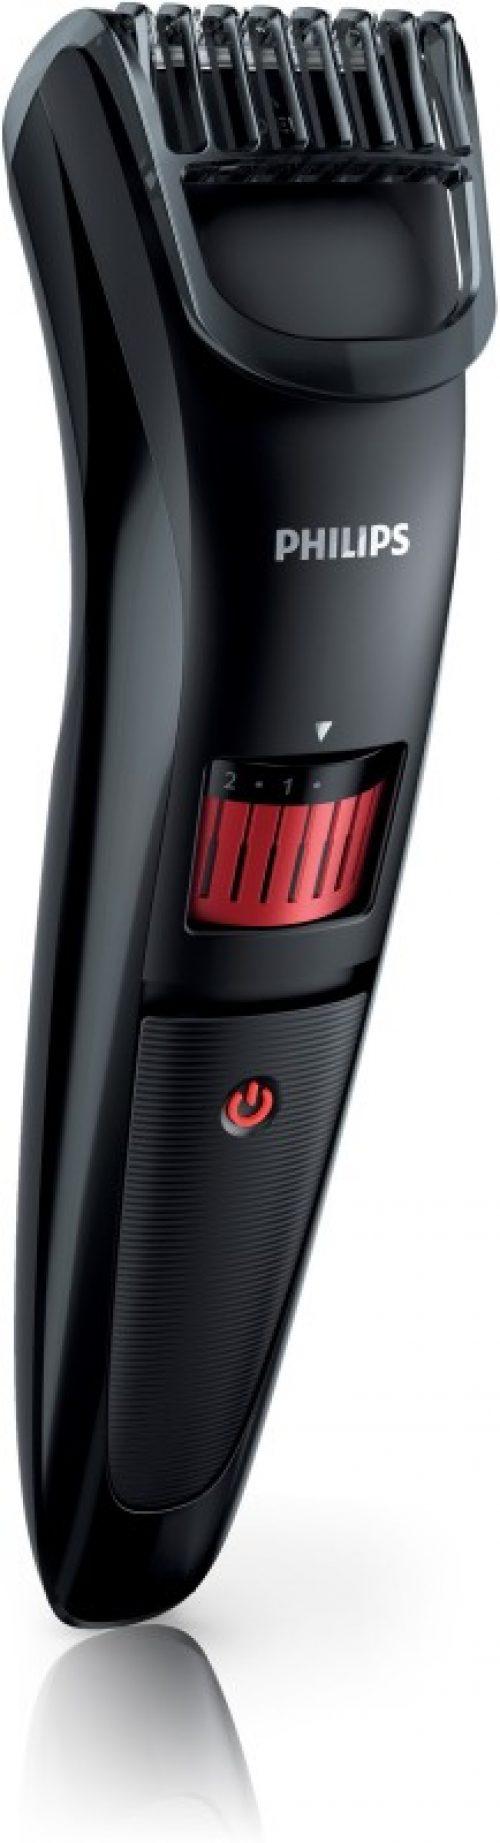 Philips QT4005/15 Pro Skin Advanced Trimmer For Men(Black)